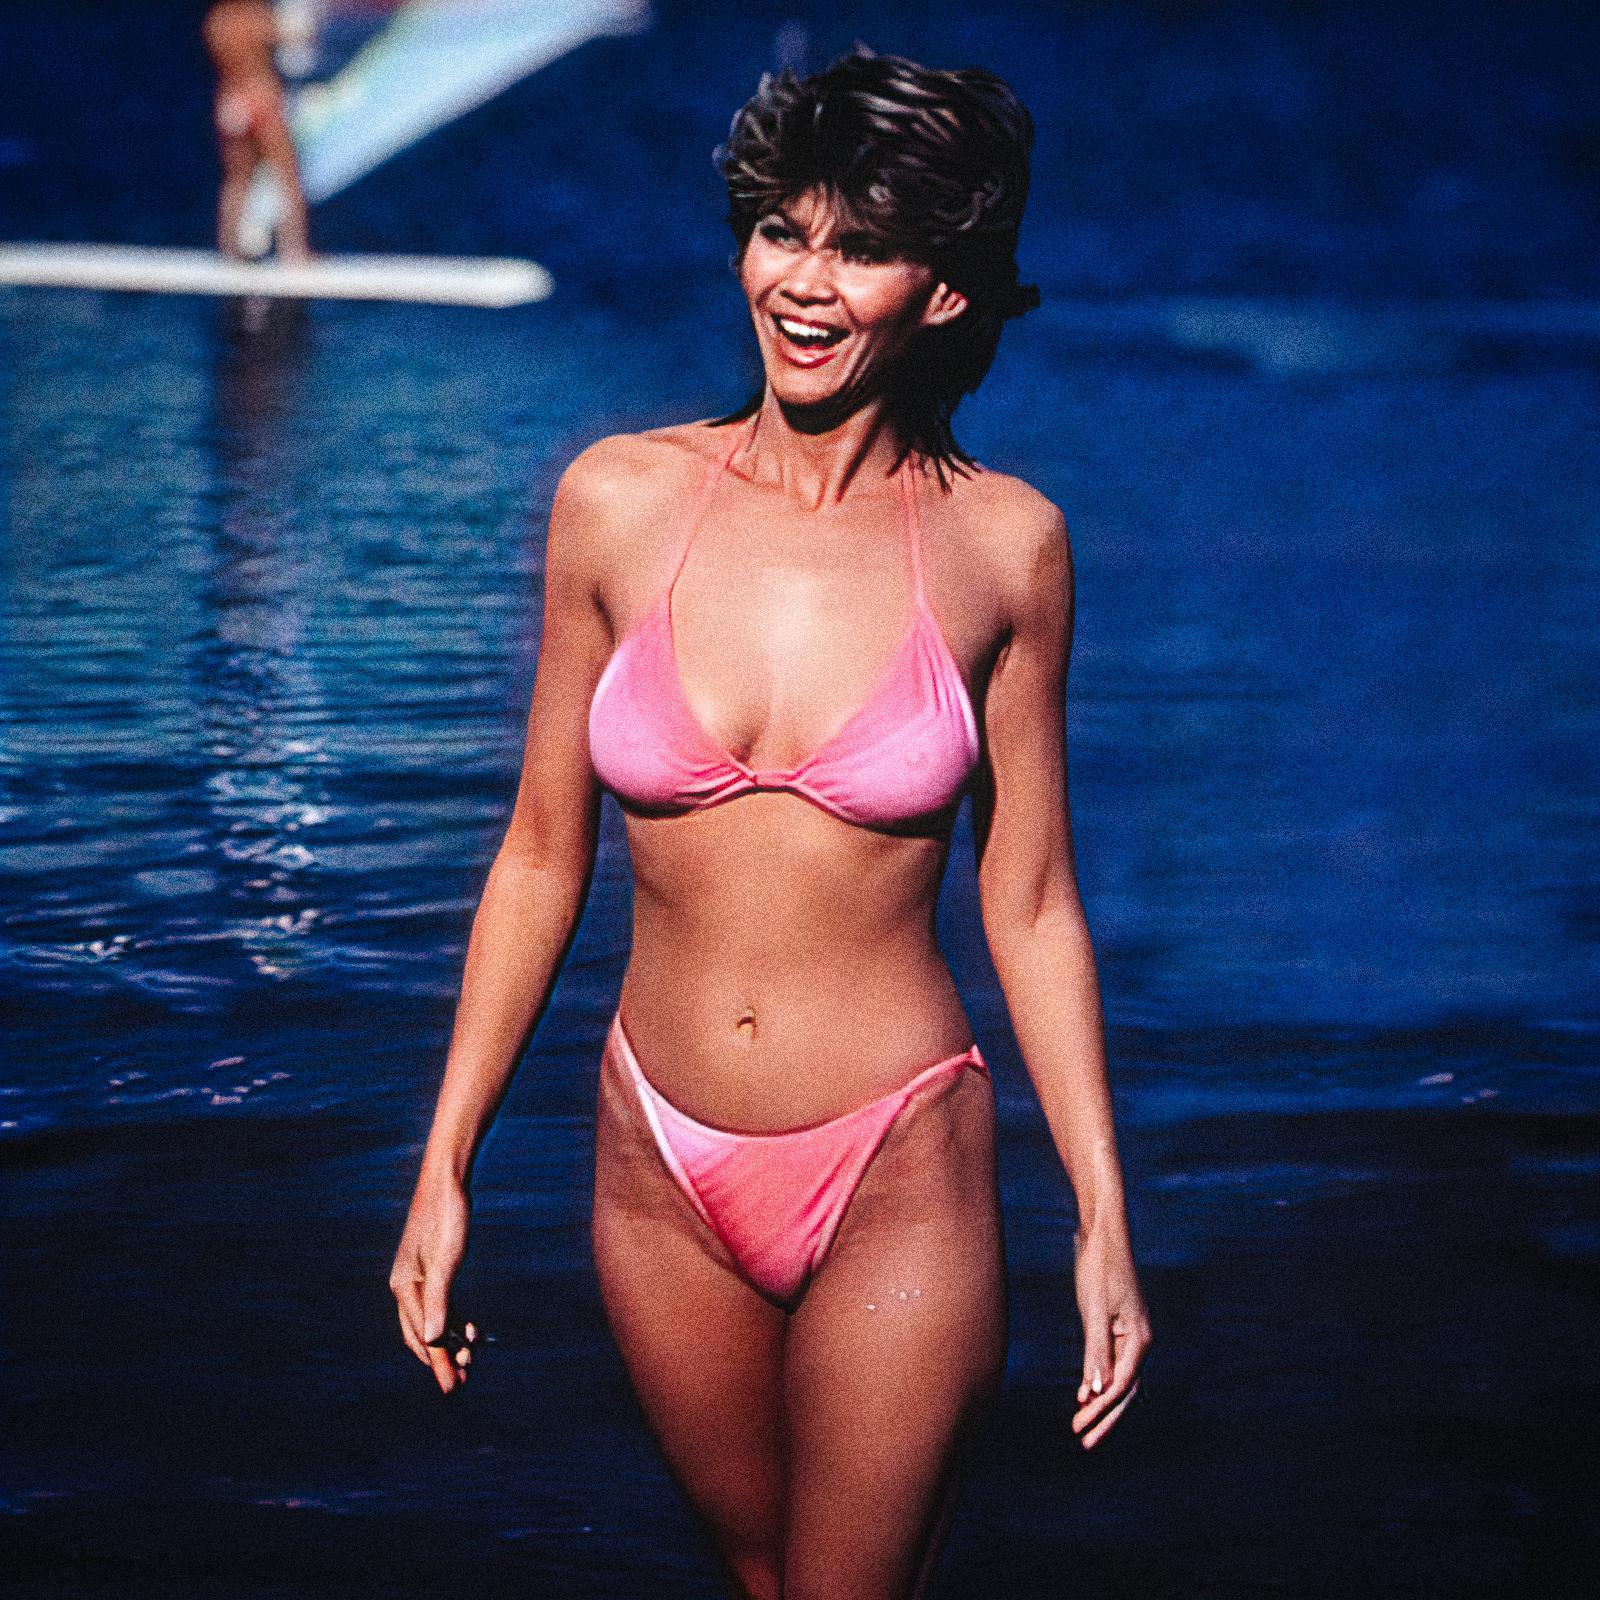 markie-post-hot-bikini-fall-guy-very_compressed-width-1600px.jpg